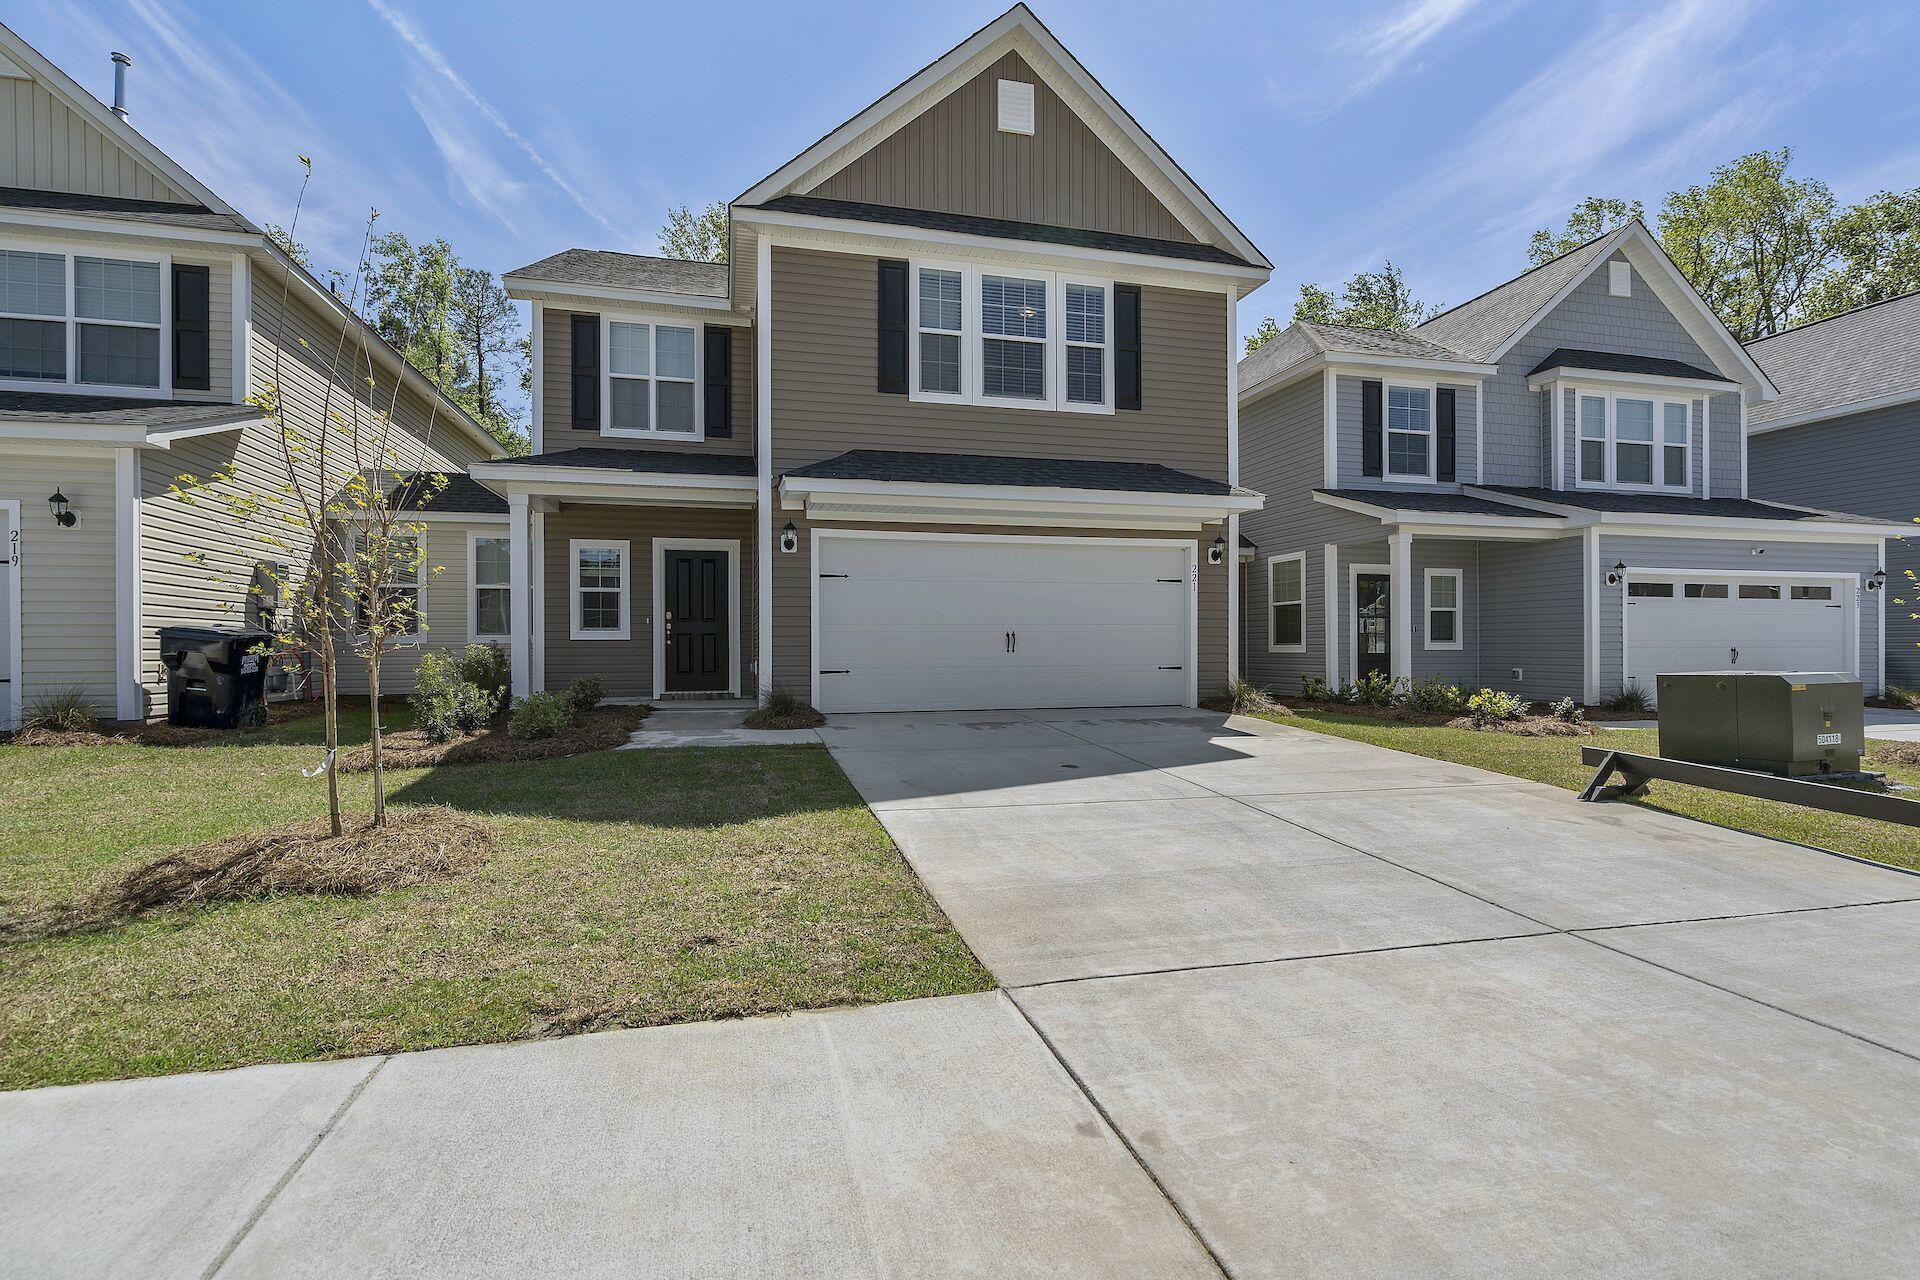 Hampton Woods Homes For Sale - 5 Mcclellan, Summerville, SC - 14